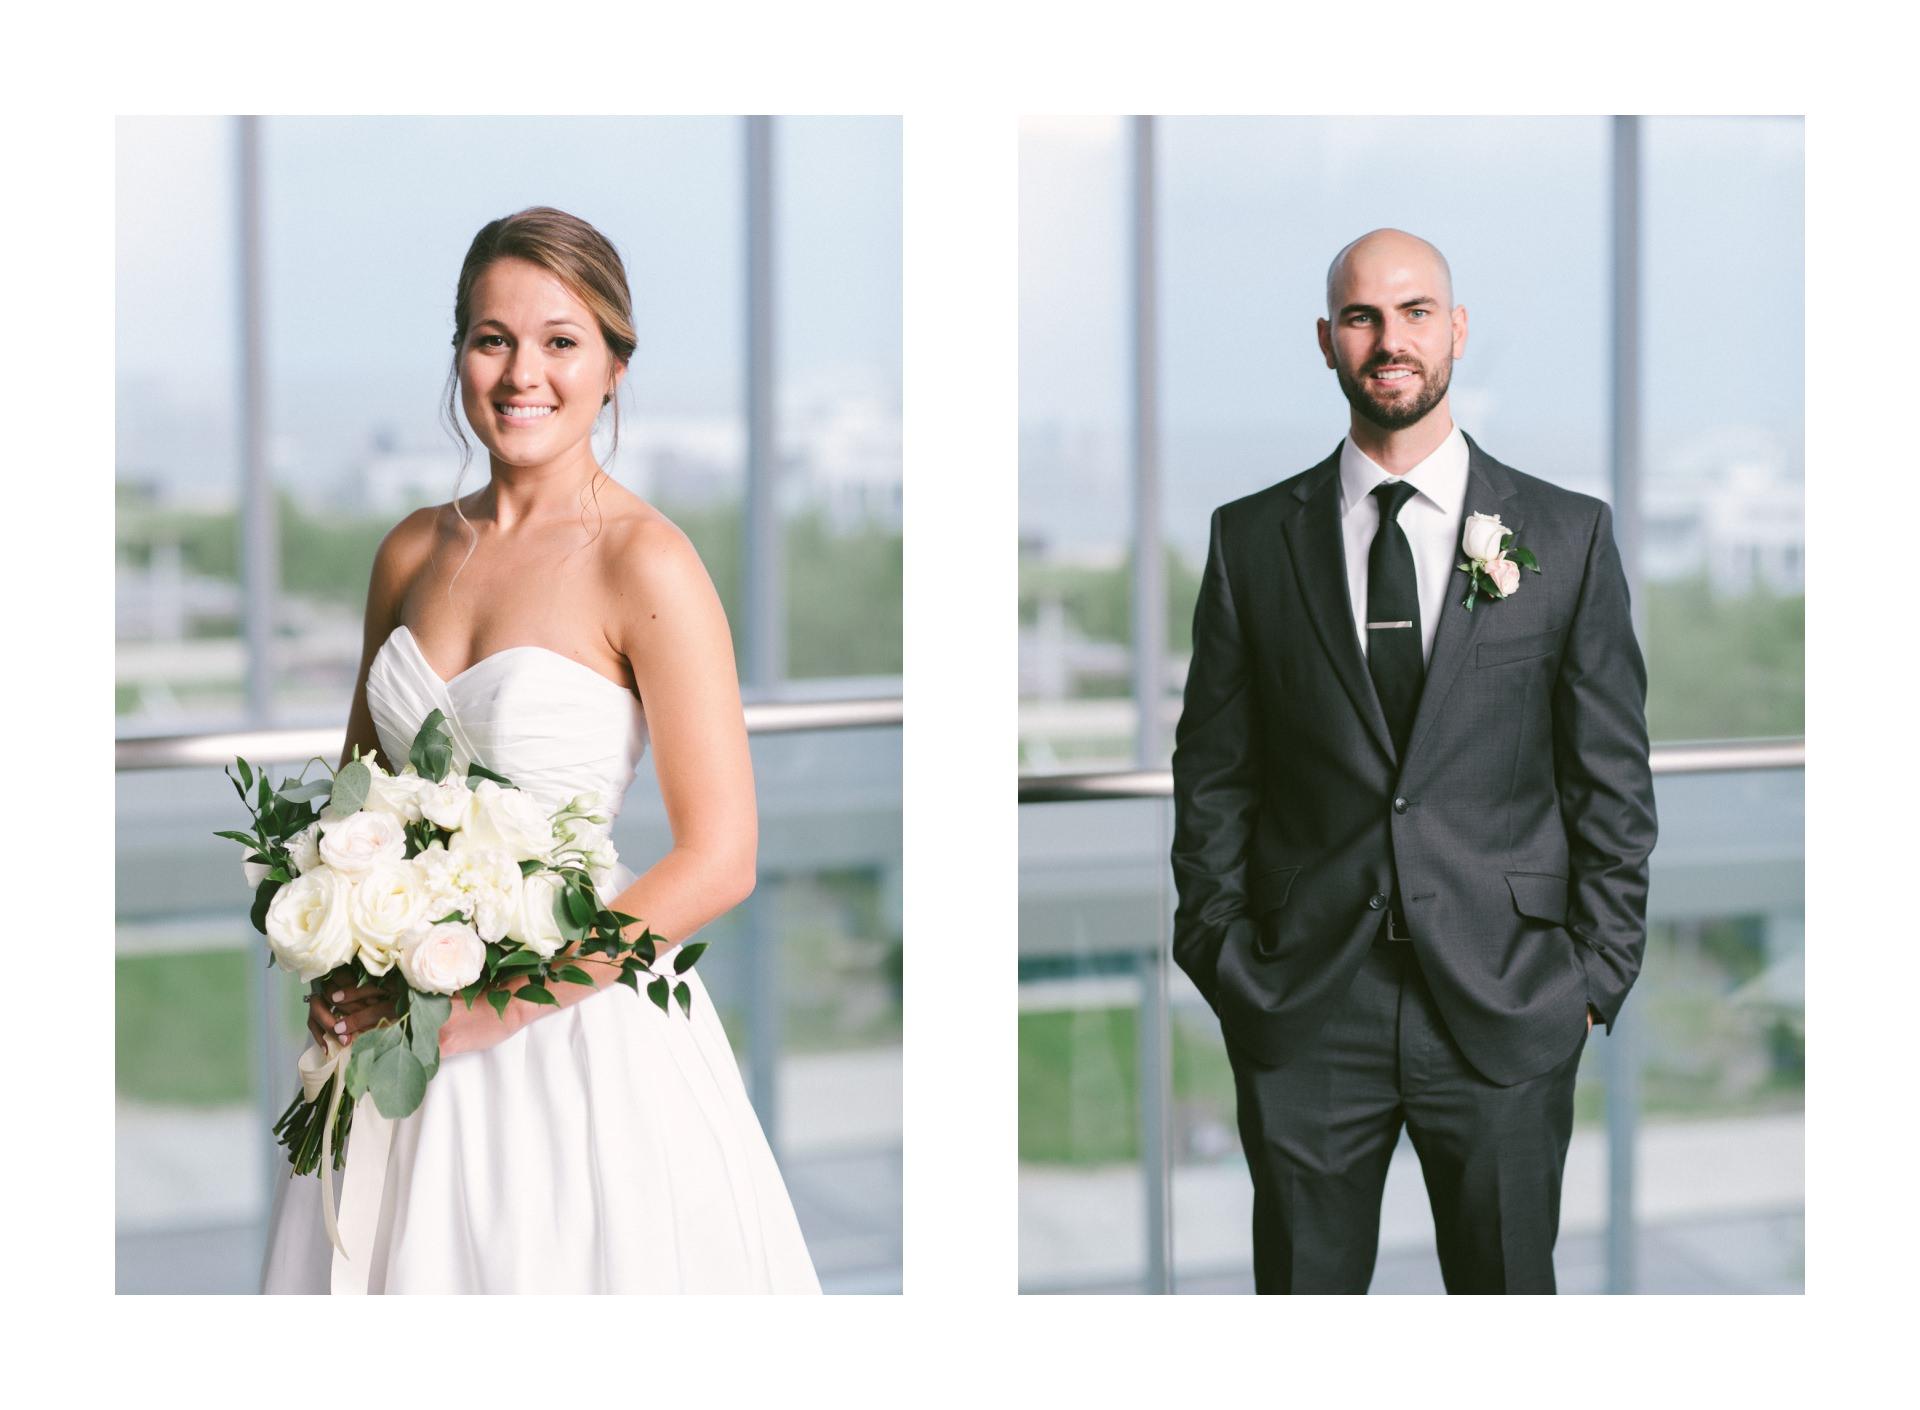 Dowtown Hilton Cleveland Wedding Photographer 2 4.jpg